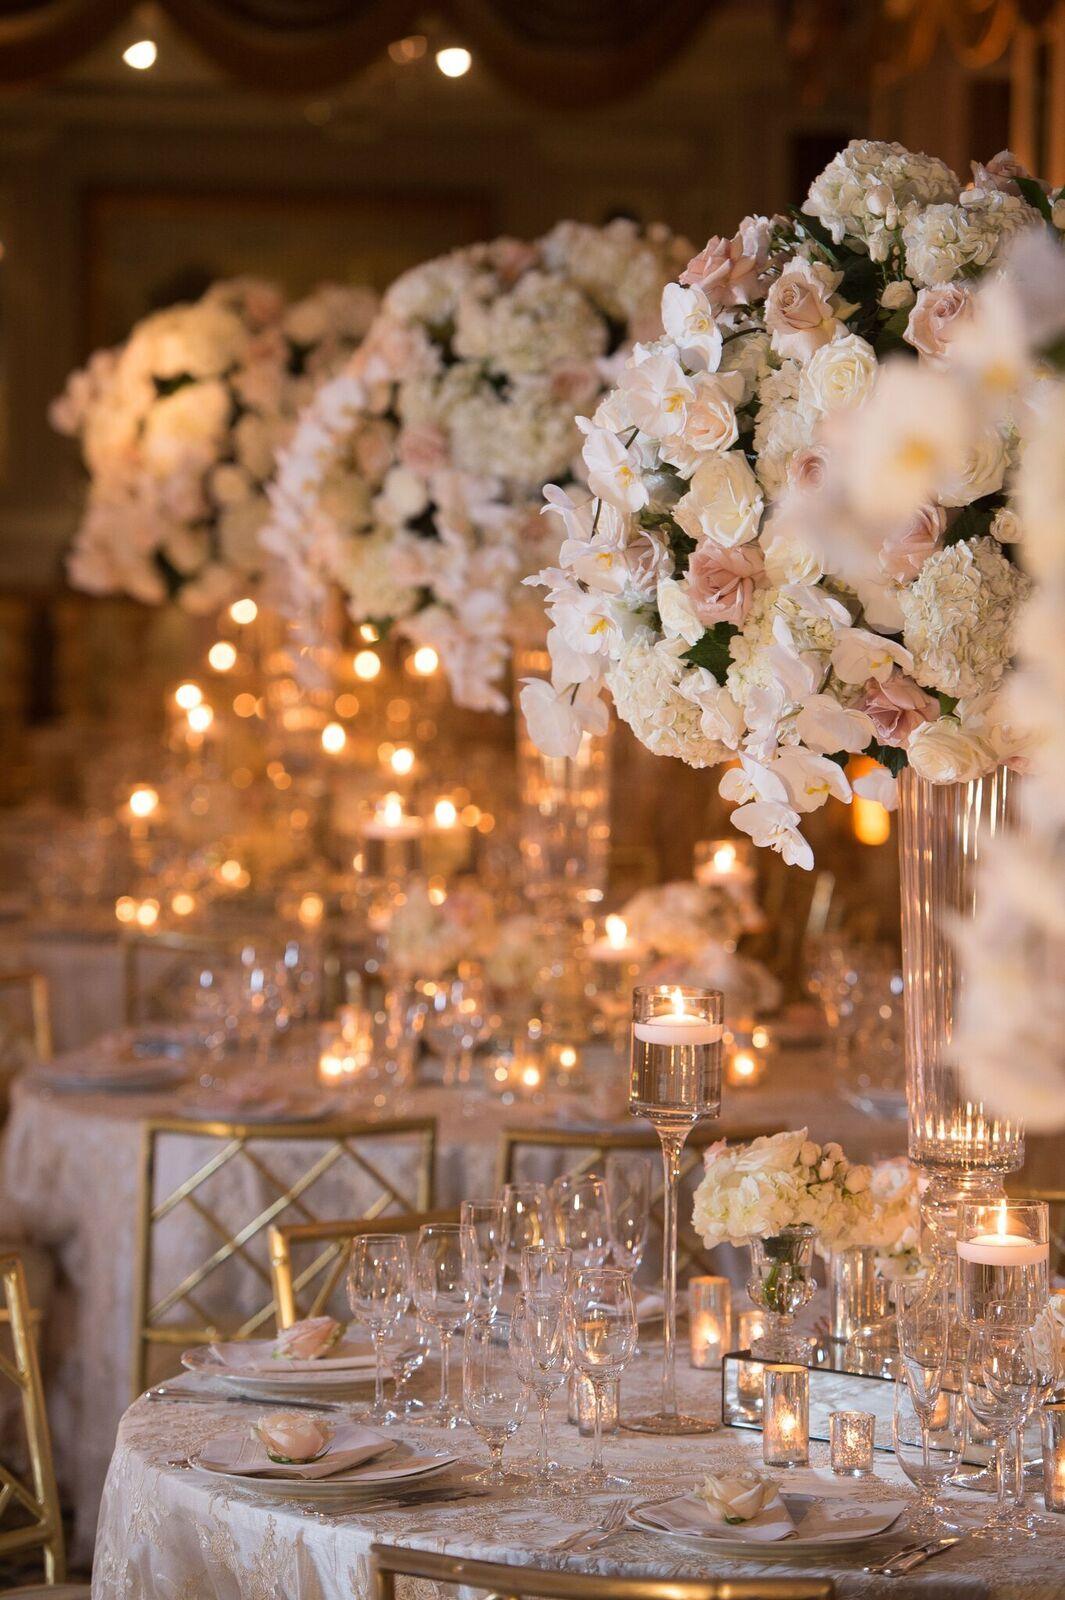 Glamorous Ballroom New York Wedding At The Pierre Hotel Modwedding Weddings Decorations Elegant Romantic Wedding Reception Decorations Elegant Wedding Decor Elegant